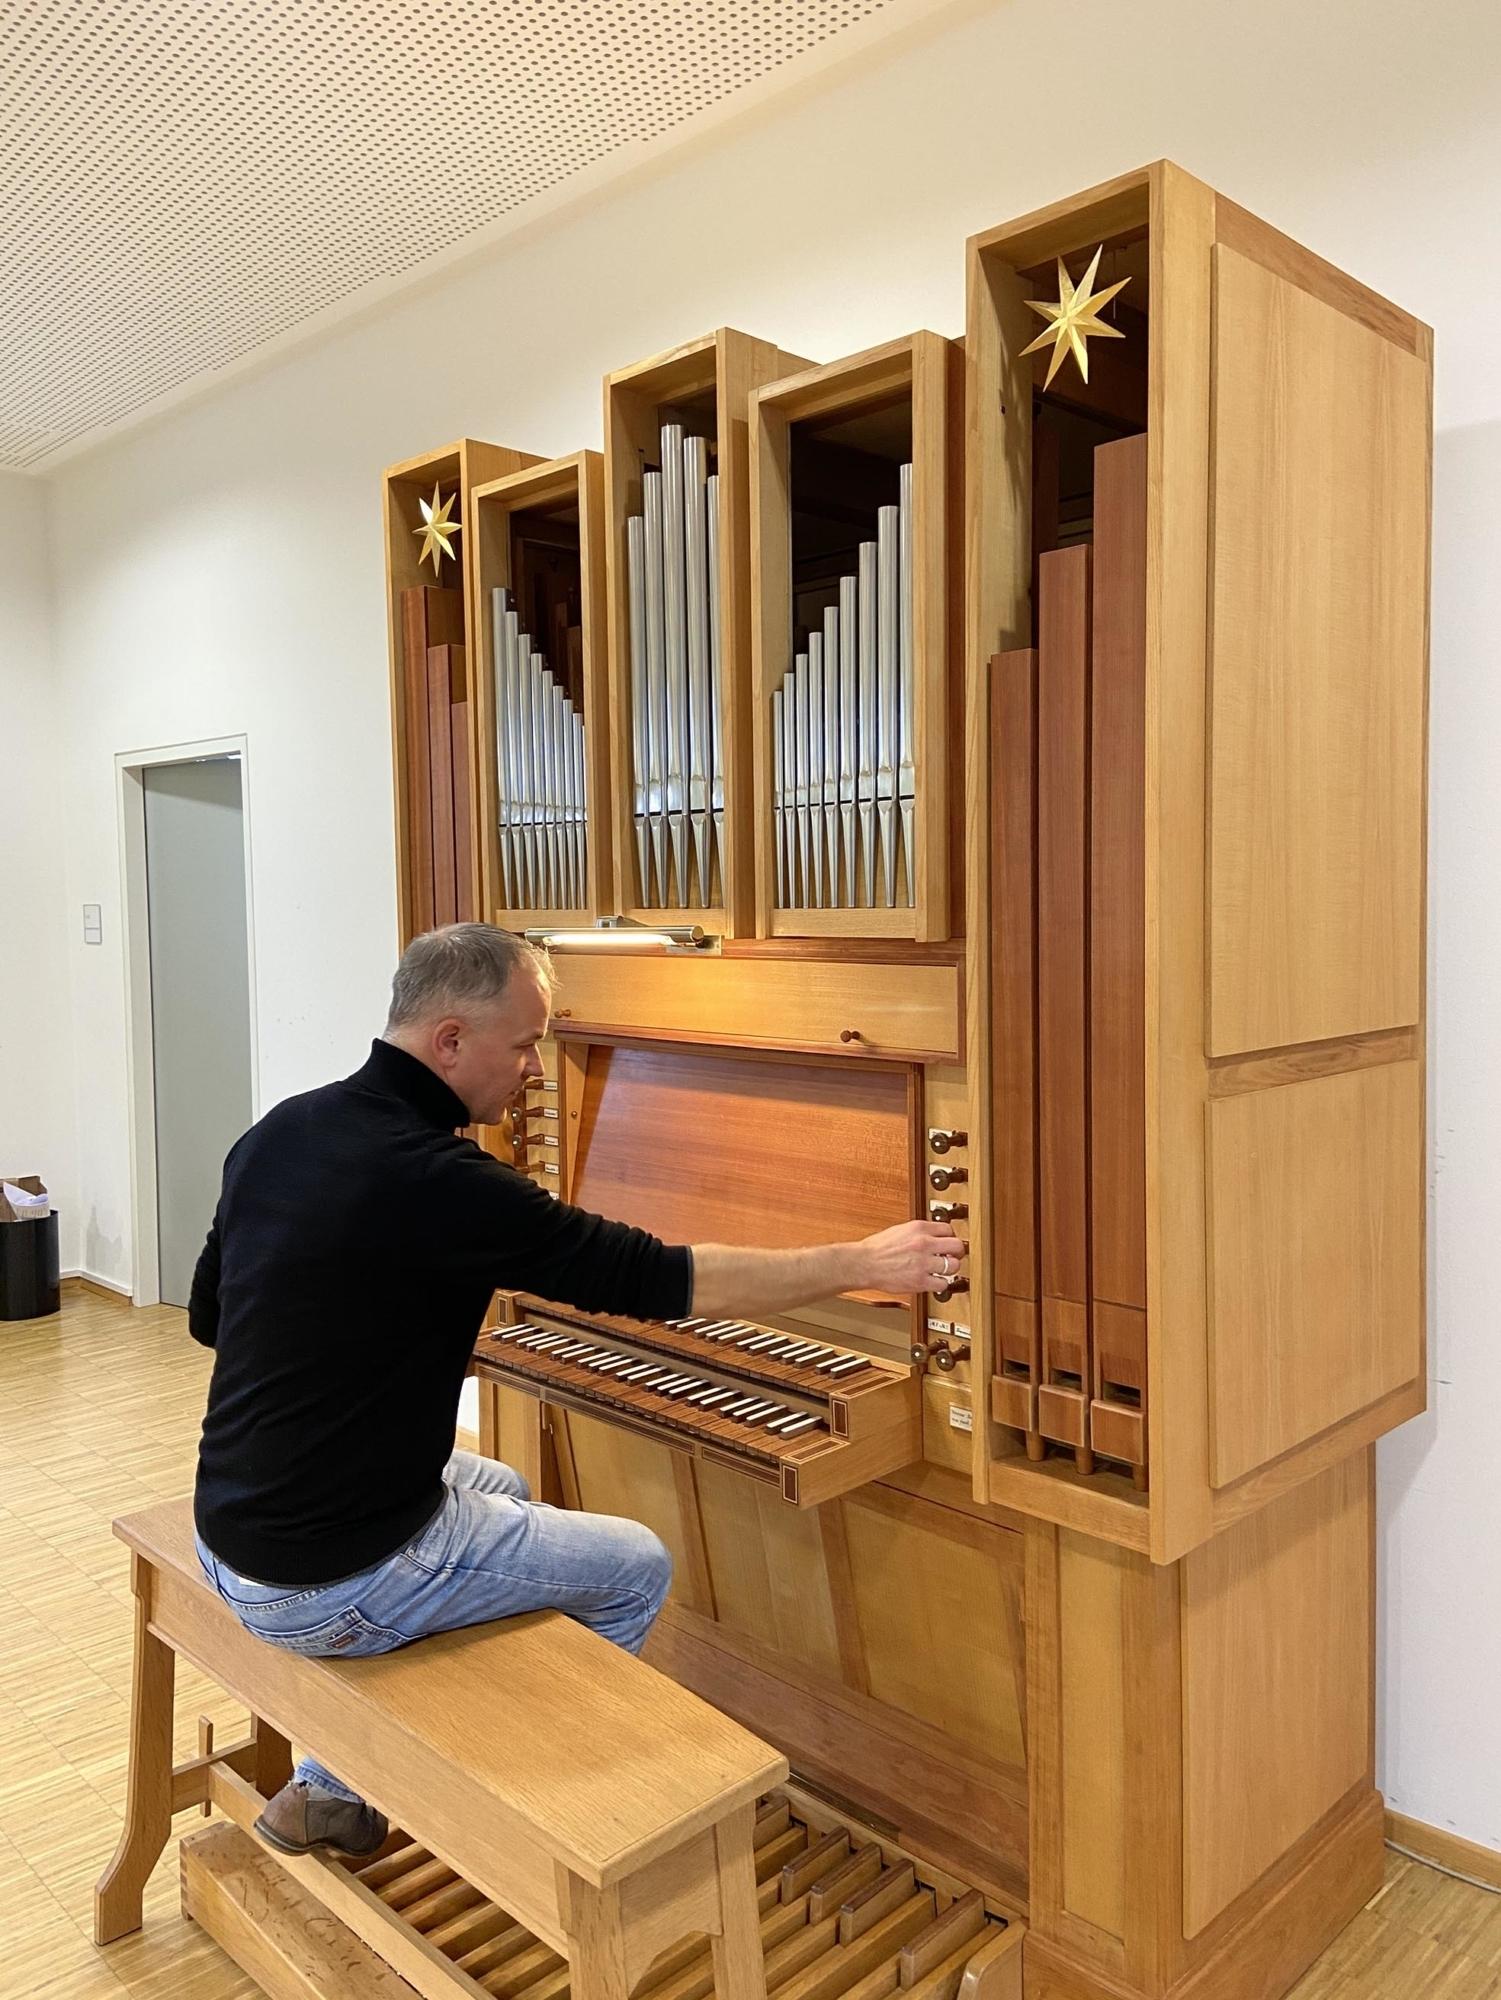 Domkapellmeister Andreas Unterguggenberger orgel PB